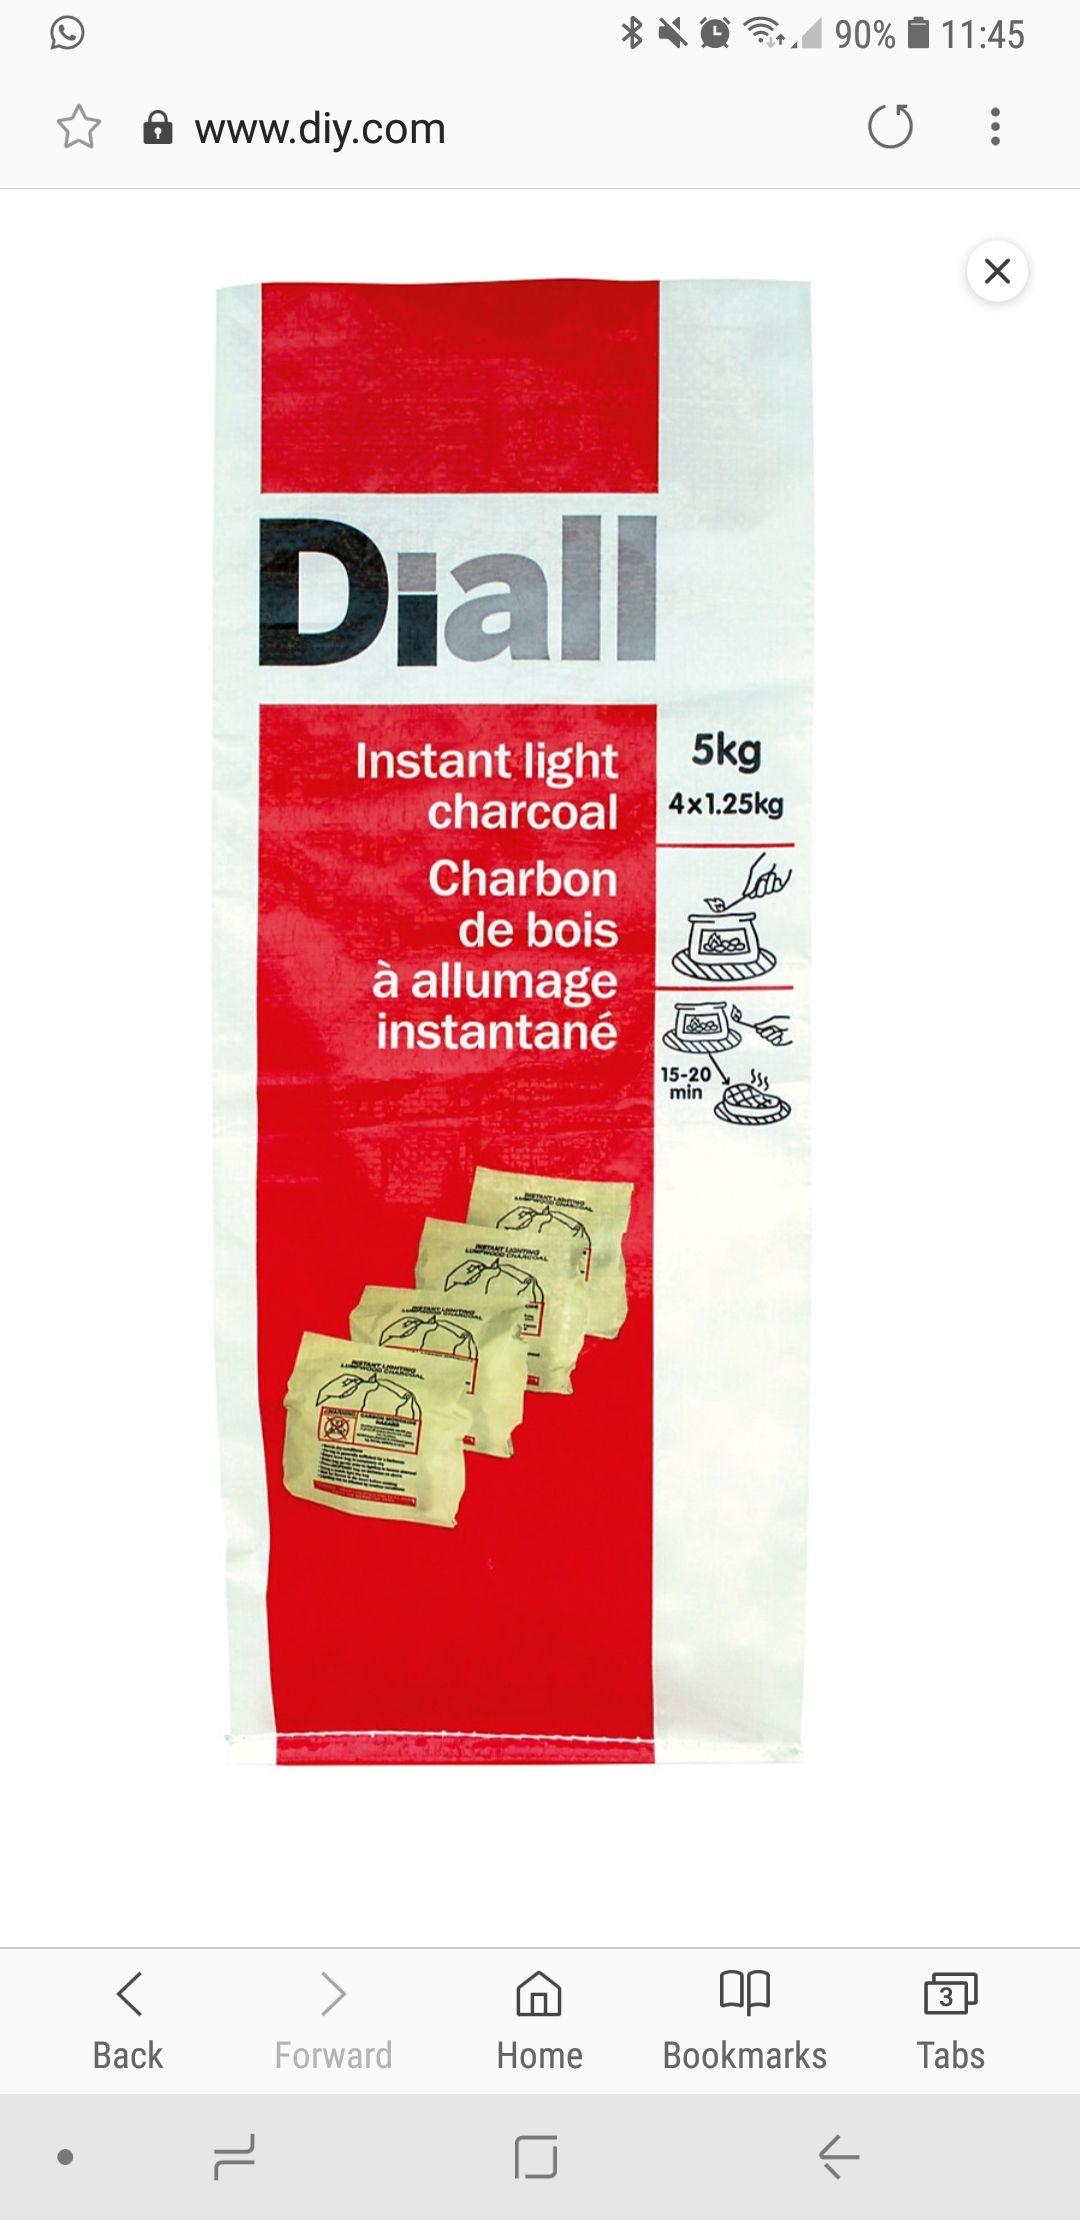 Diall instant light charcoal 4 x 1.25  kg - £3 @ B&Q